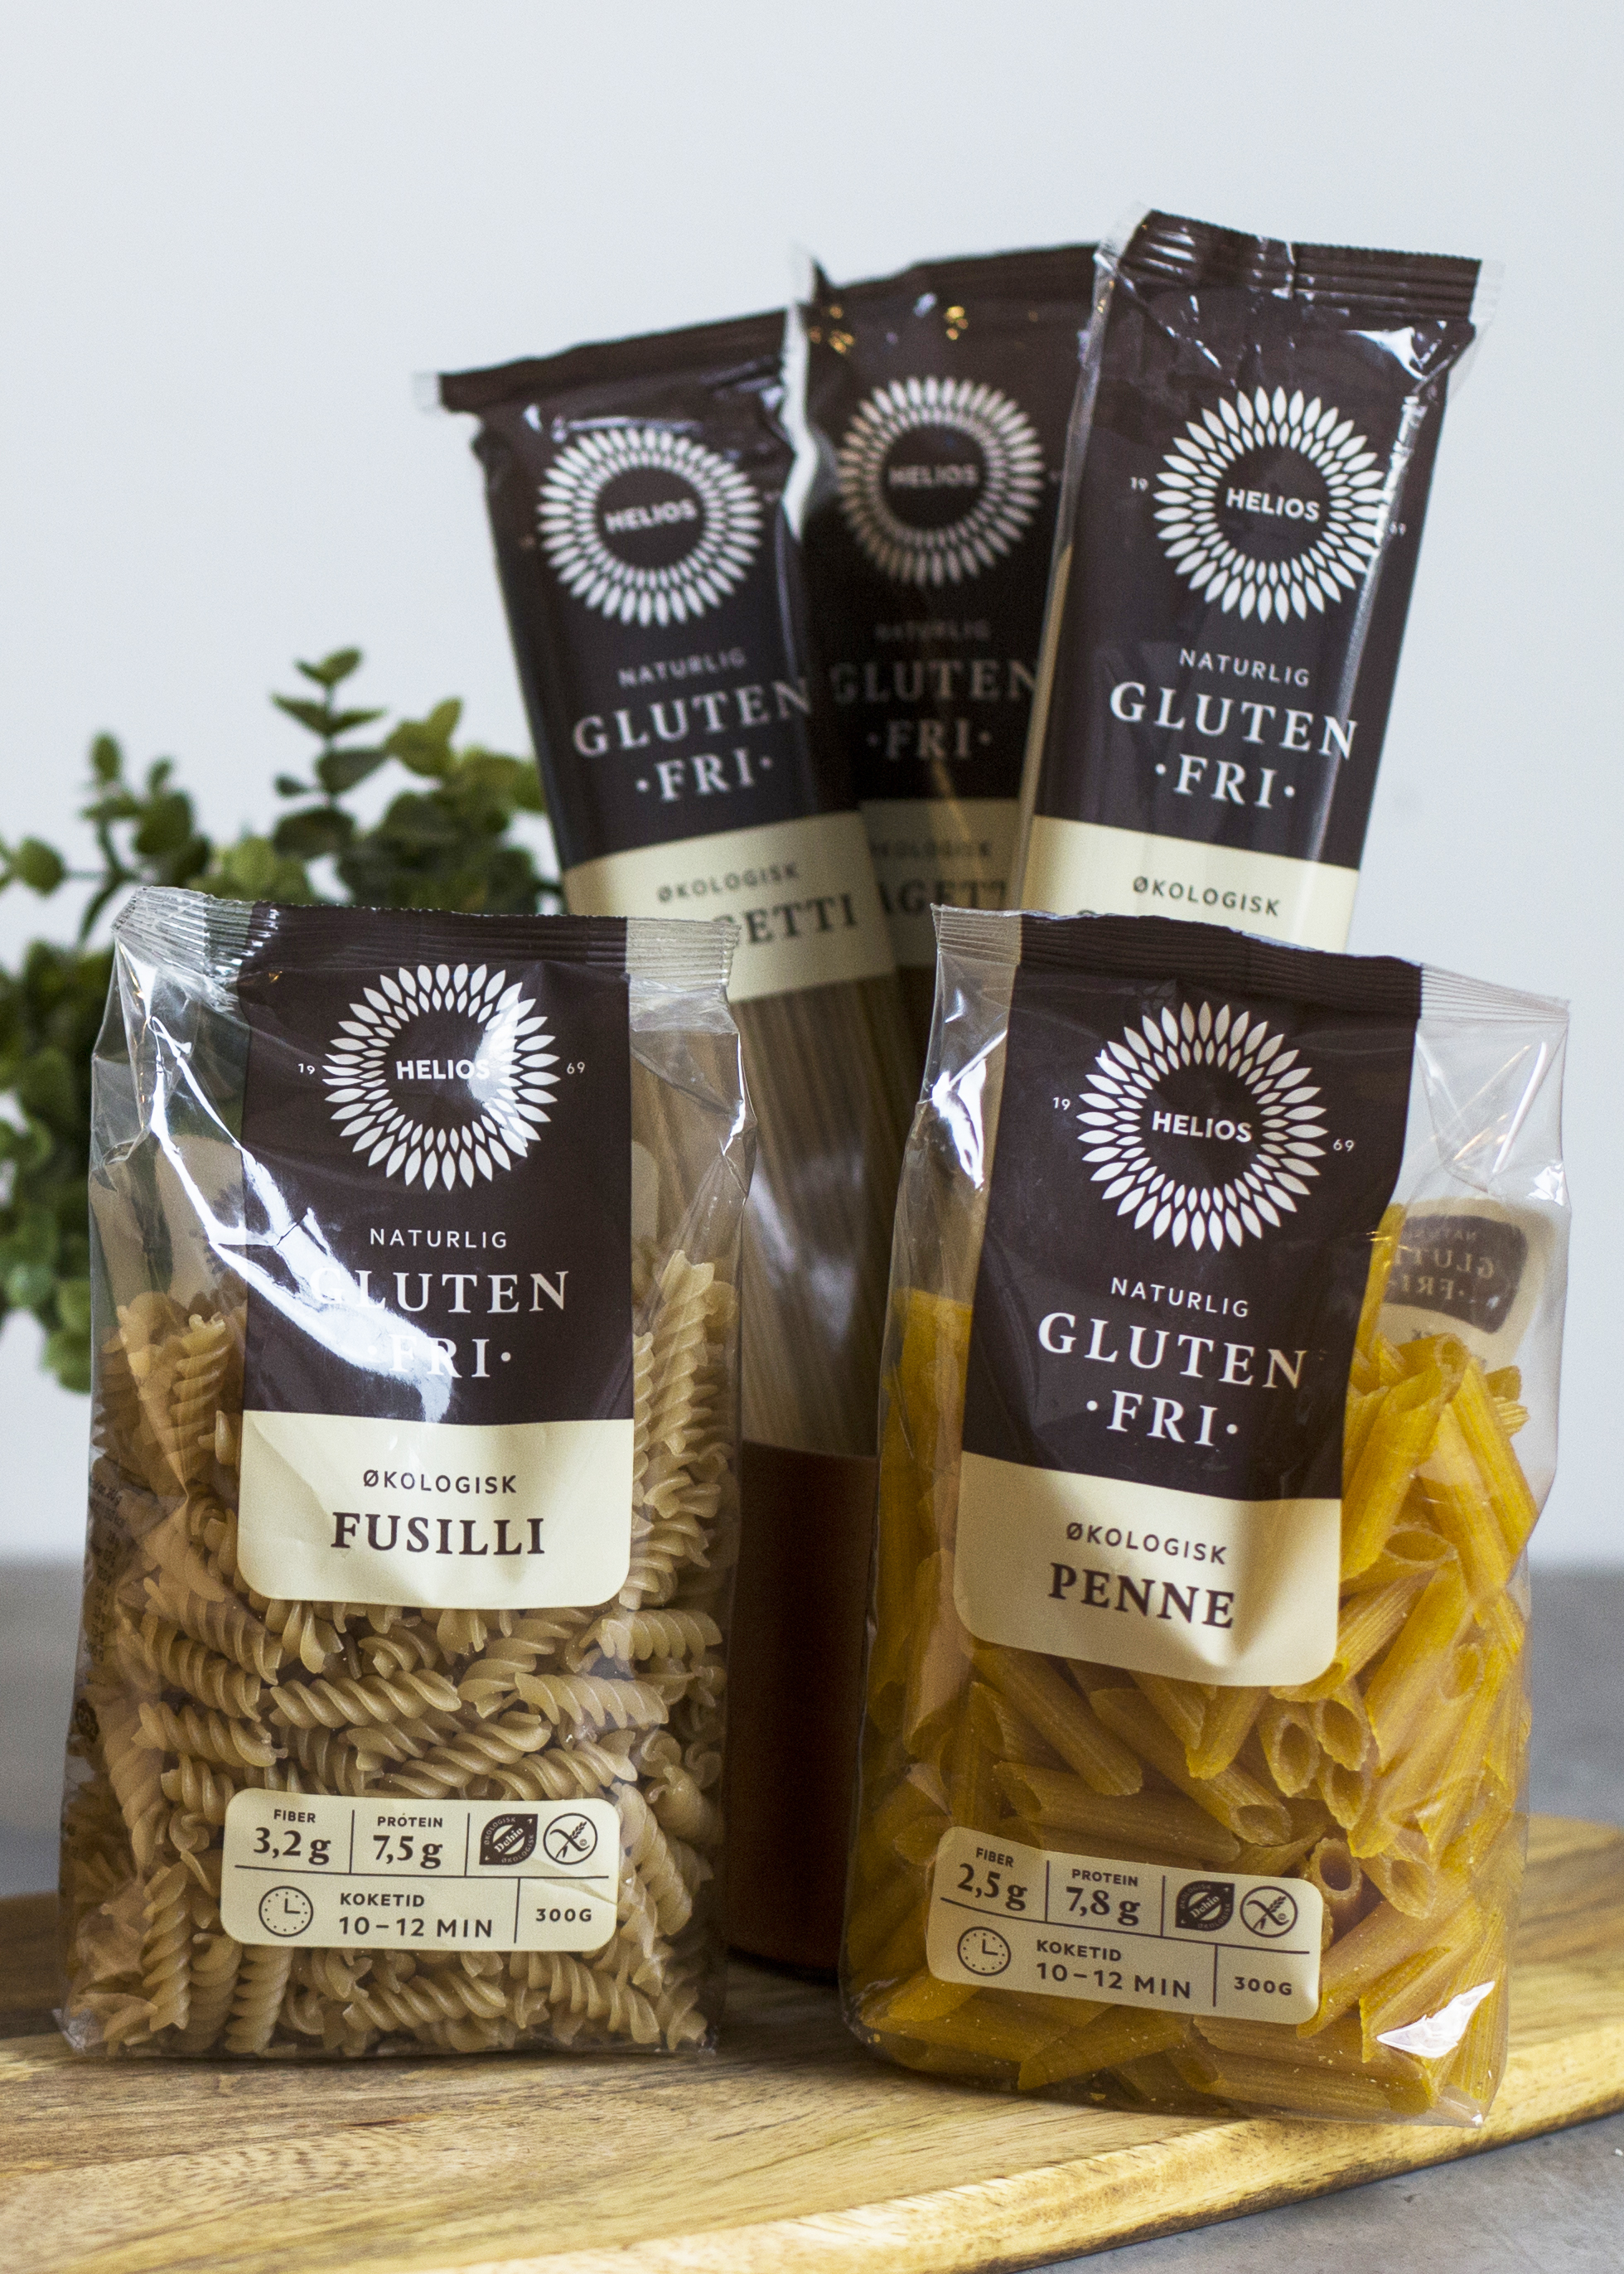 HELIOS glutenfri pasta lysere.jpg